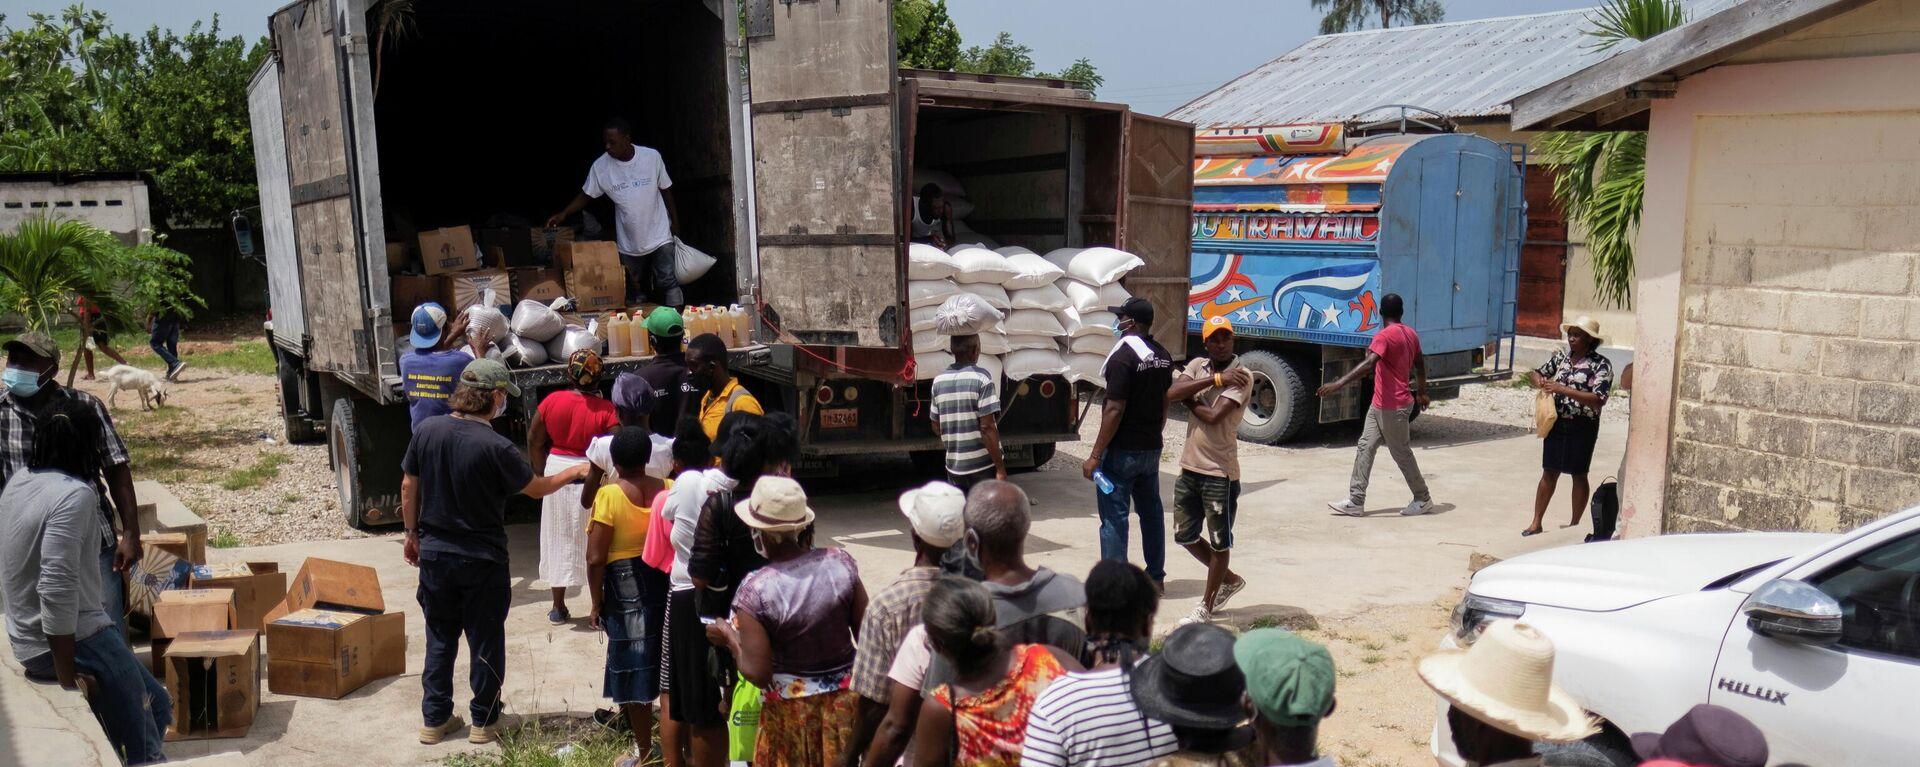 Hambre en Haití tras el terremoto - Sputnik Mundo, 1920, 30.08.2021